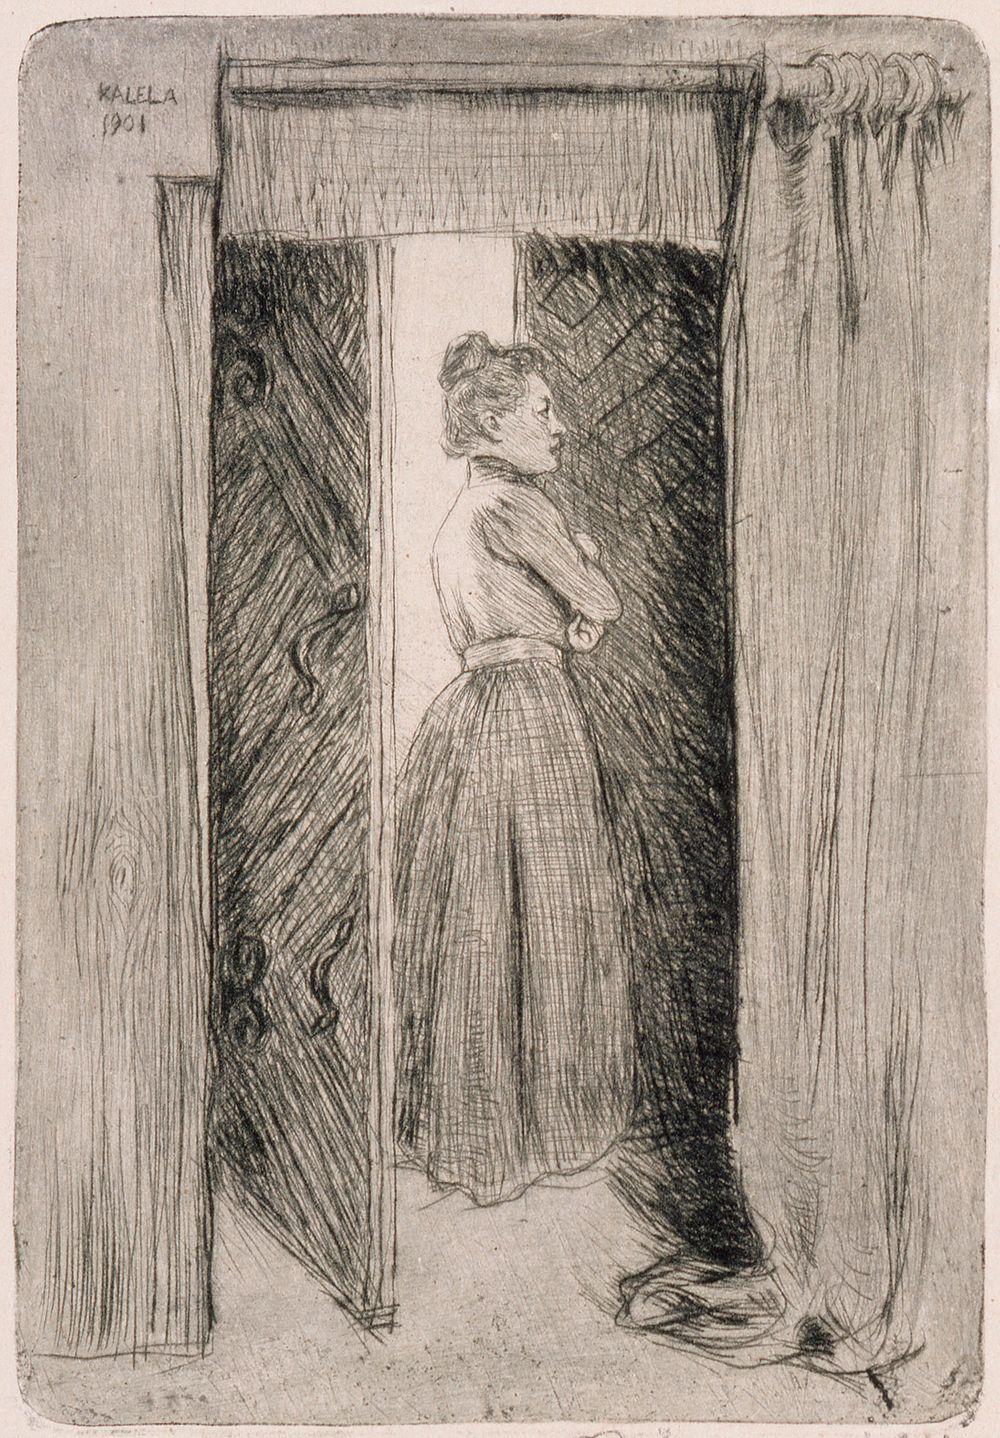 Mary Gallen oviaukossa